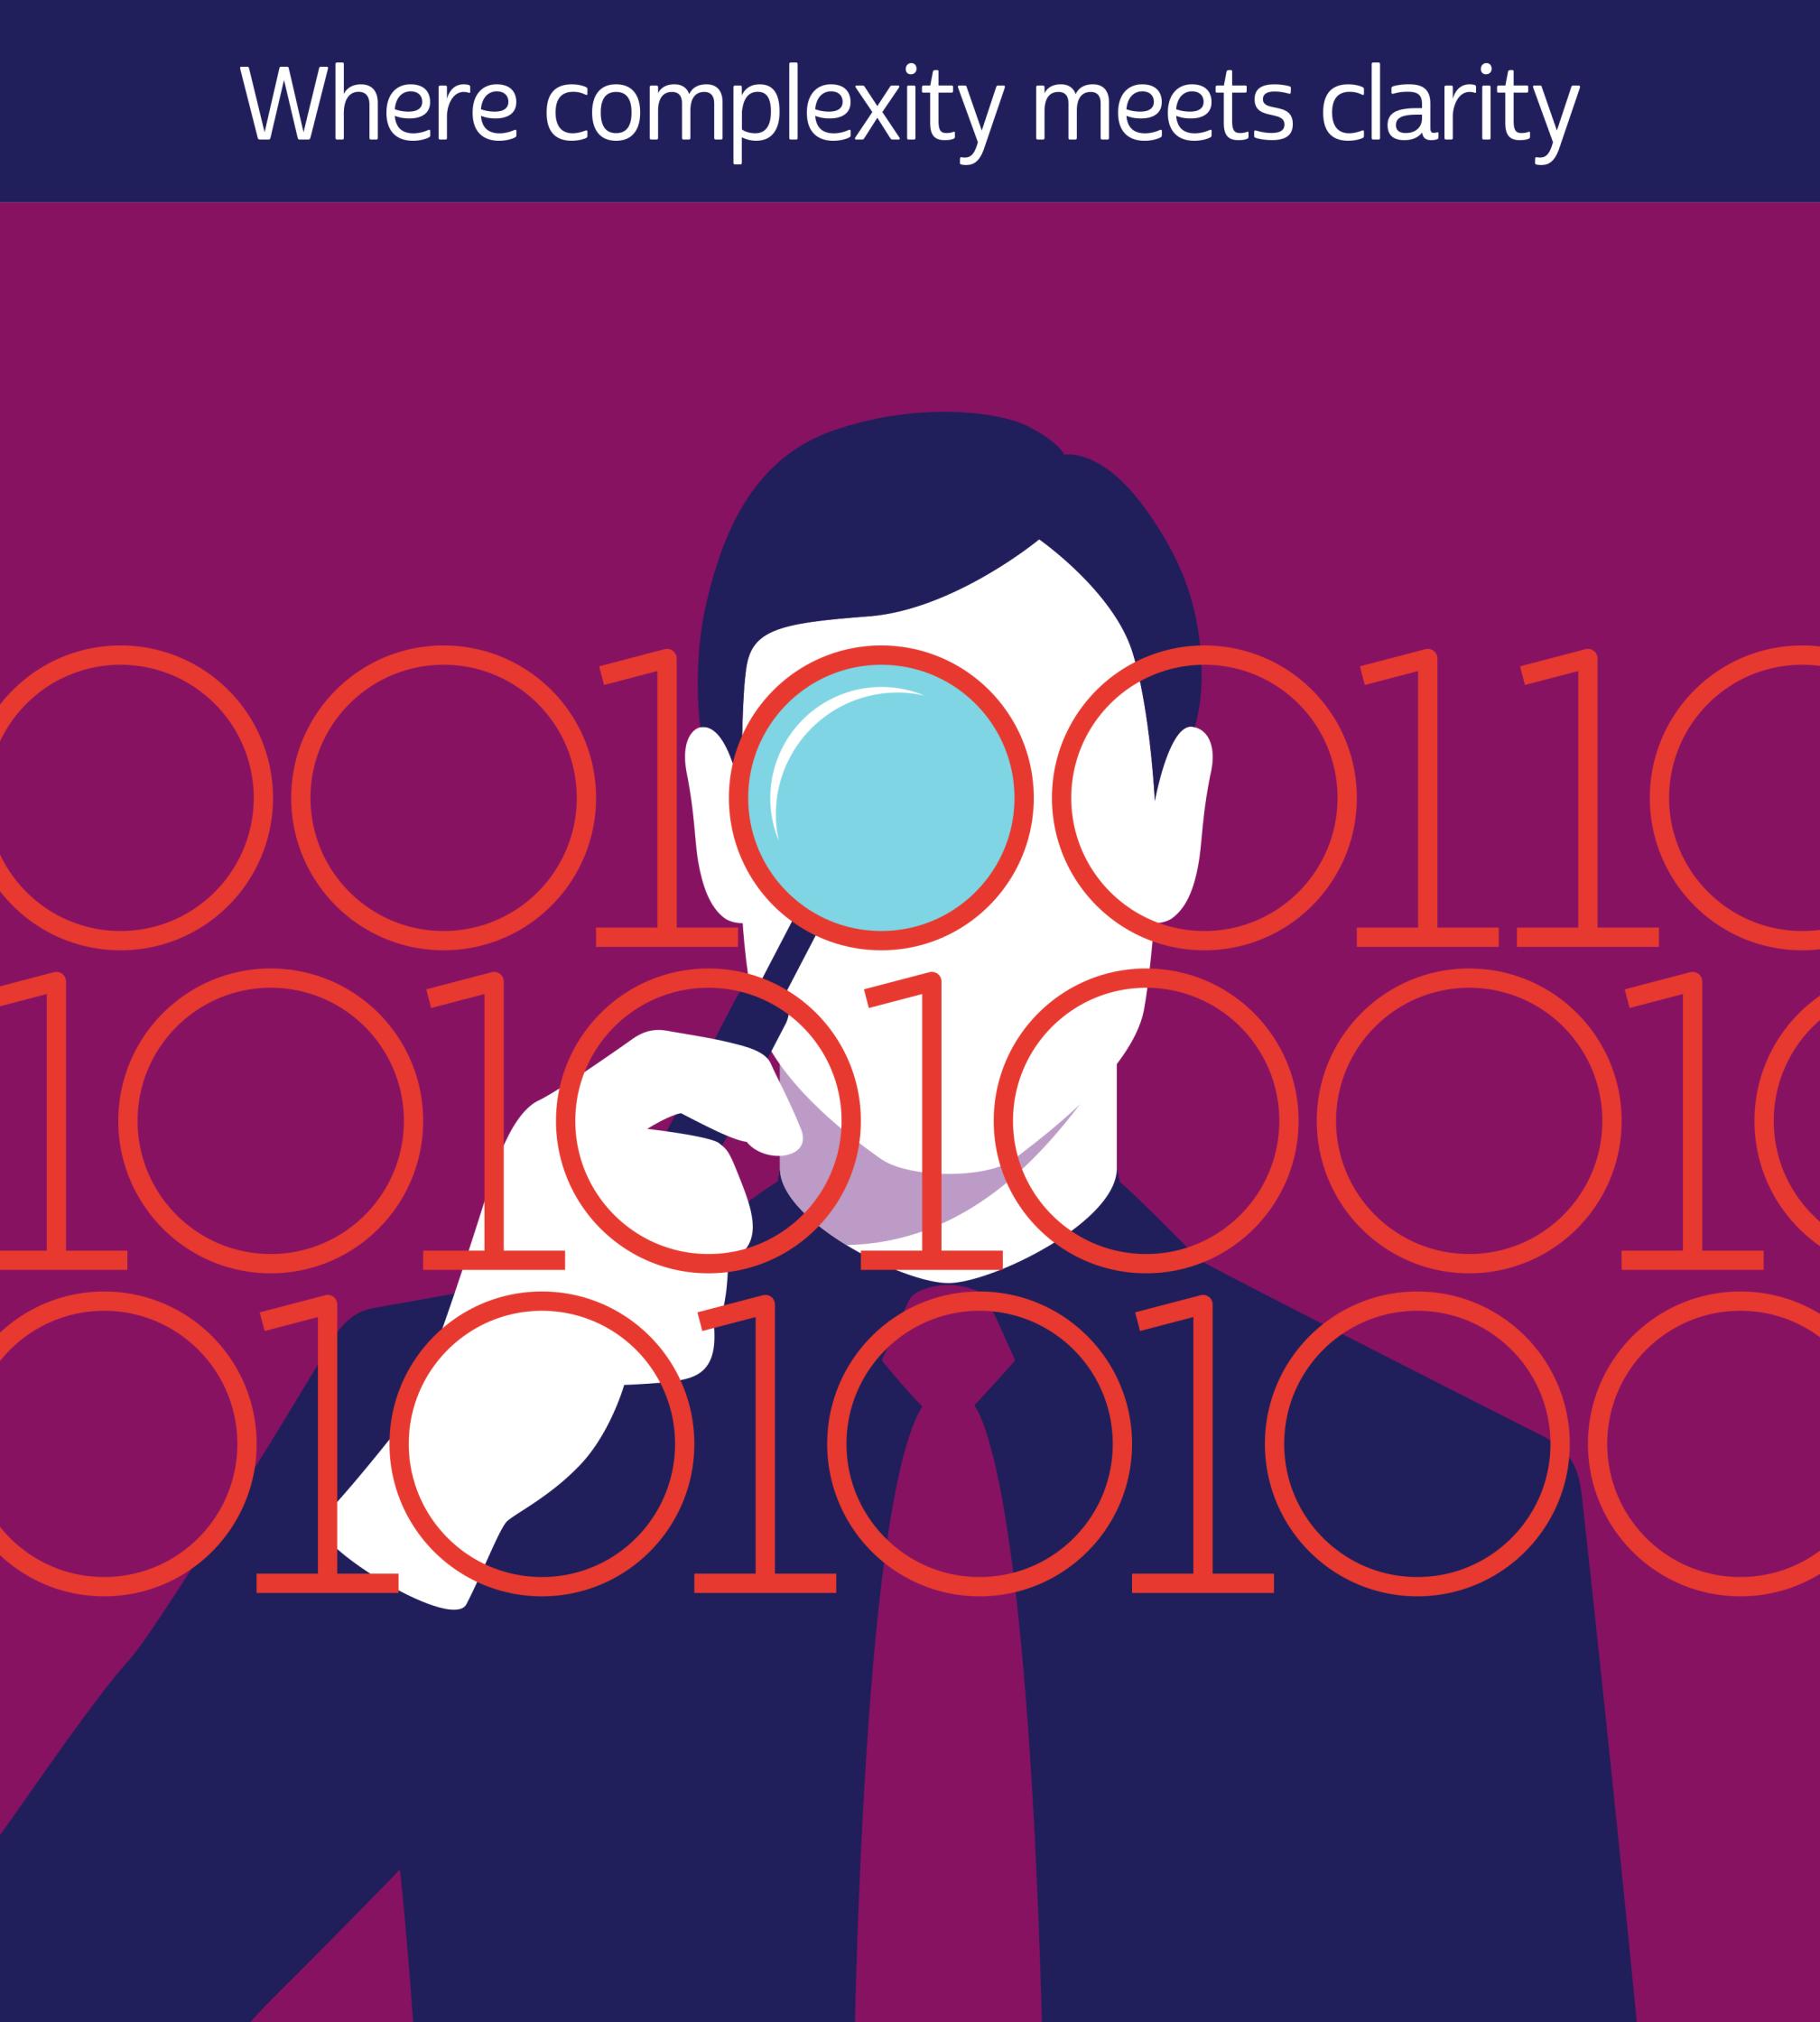 Konexo-Complexity-Meets-Clarity.jpg